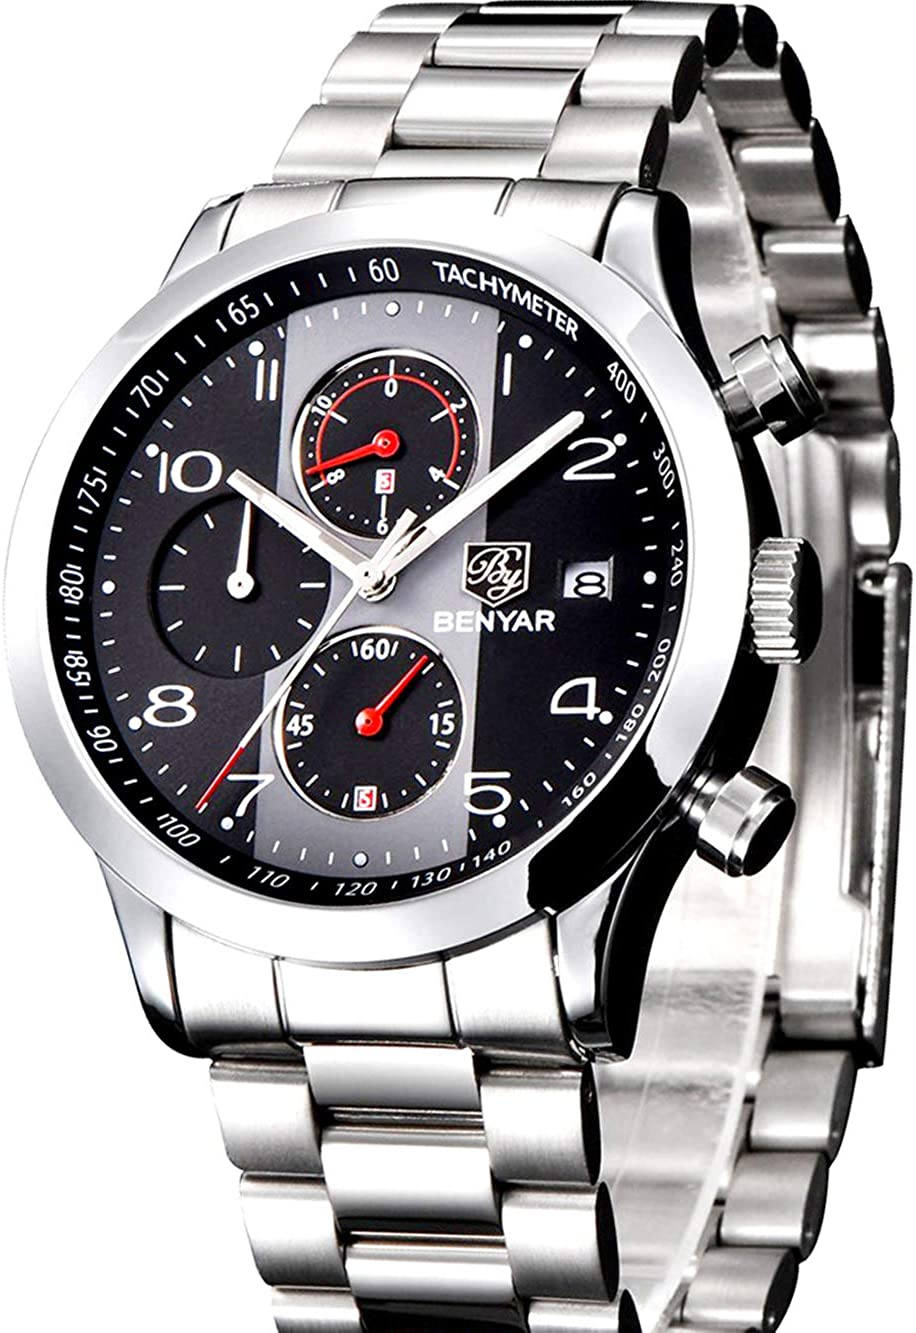 Relojes de Moda Hombre Moda Impermeable de Acero Inoxidable de Cuero de Cuarzo analógico de Seis Pines cronógrafo Reloj de Pulsera clásico Reloj Casual